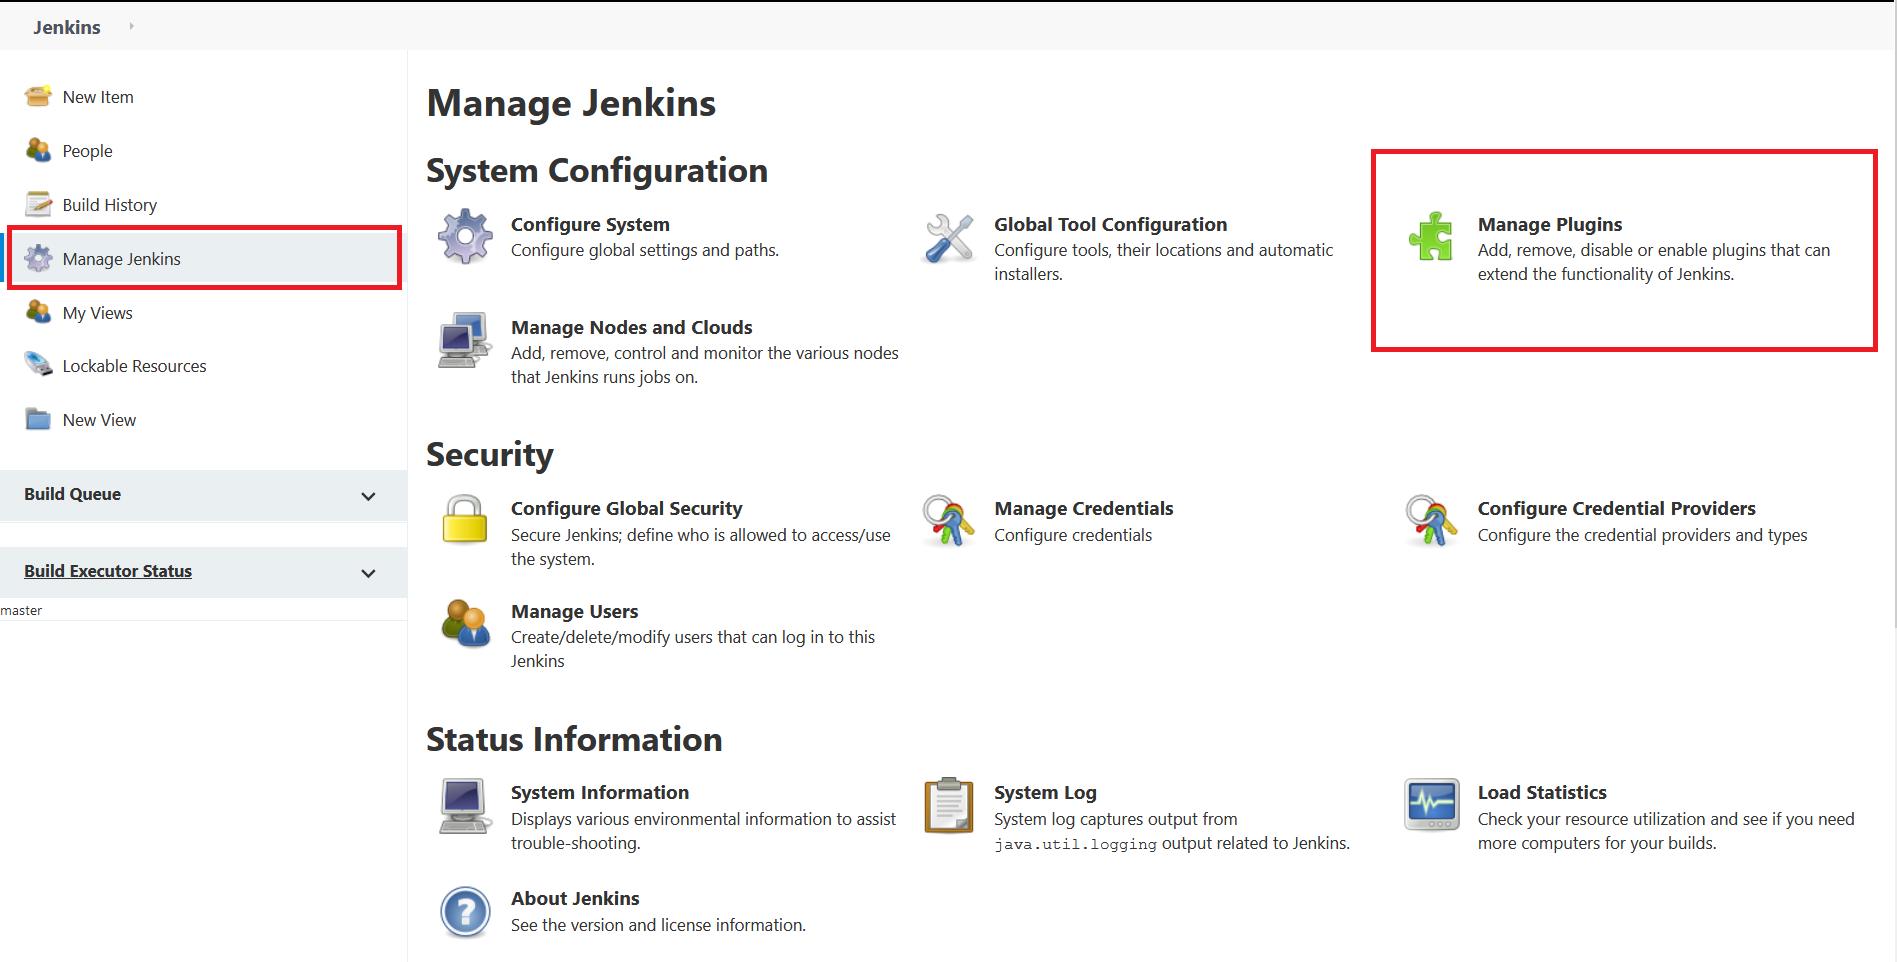 download upload and apply jenkins plugin manage plugin